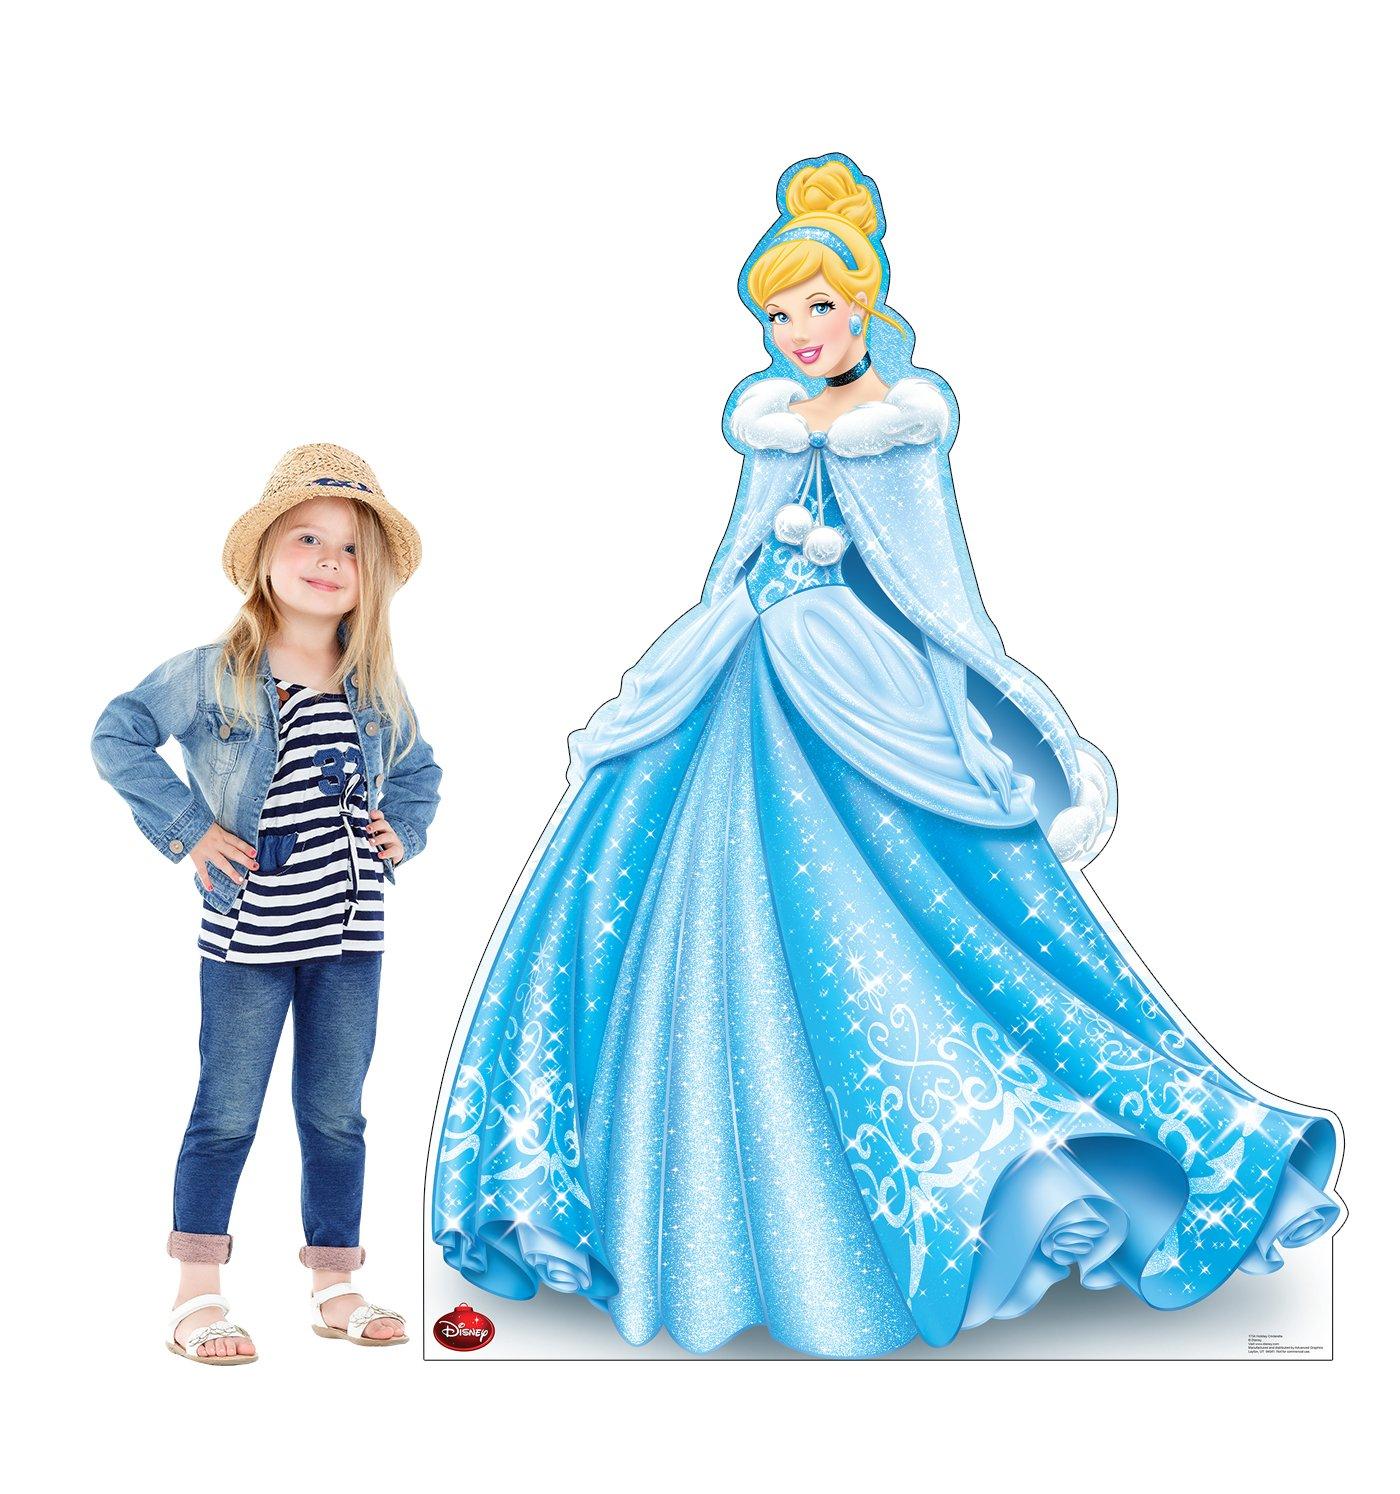 Amazon.com: Advanced Graphics Holiday Cinderella Life Size Cardboard ...